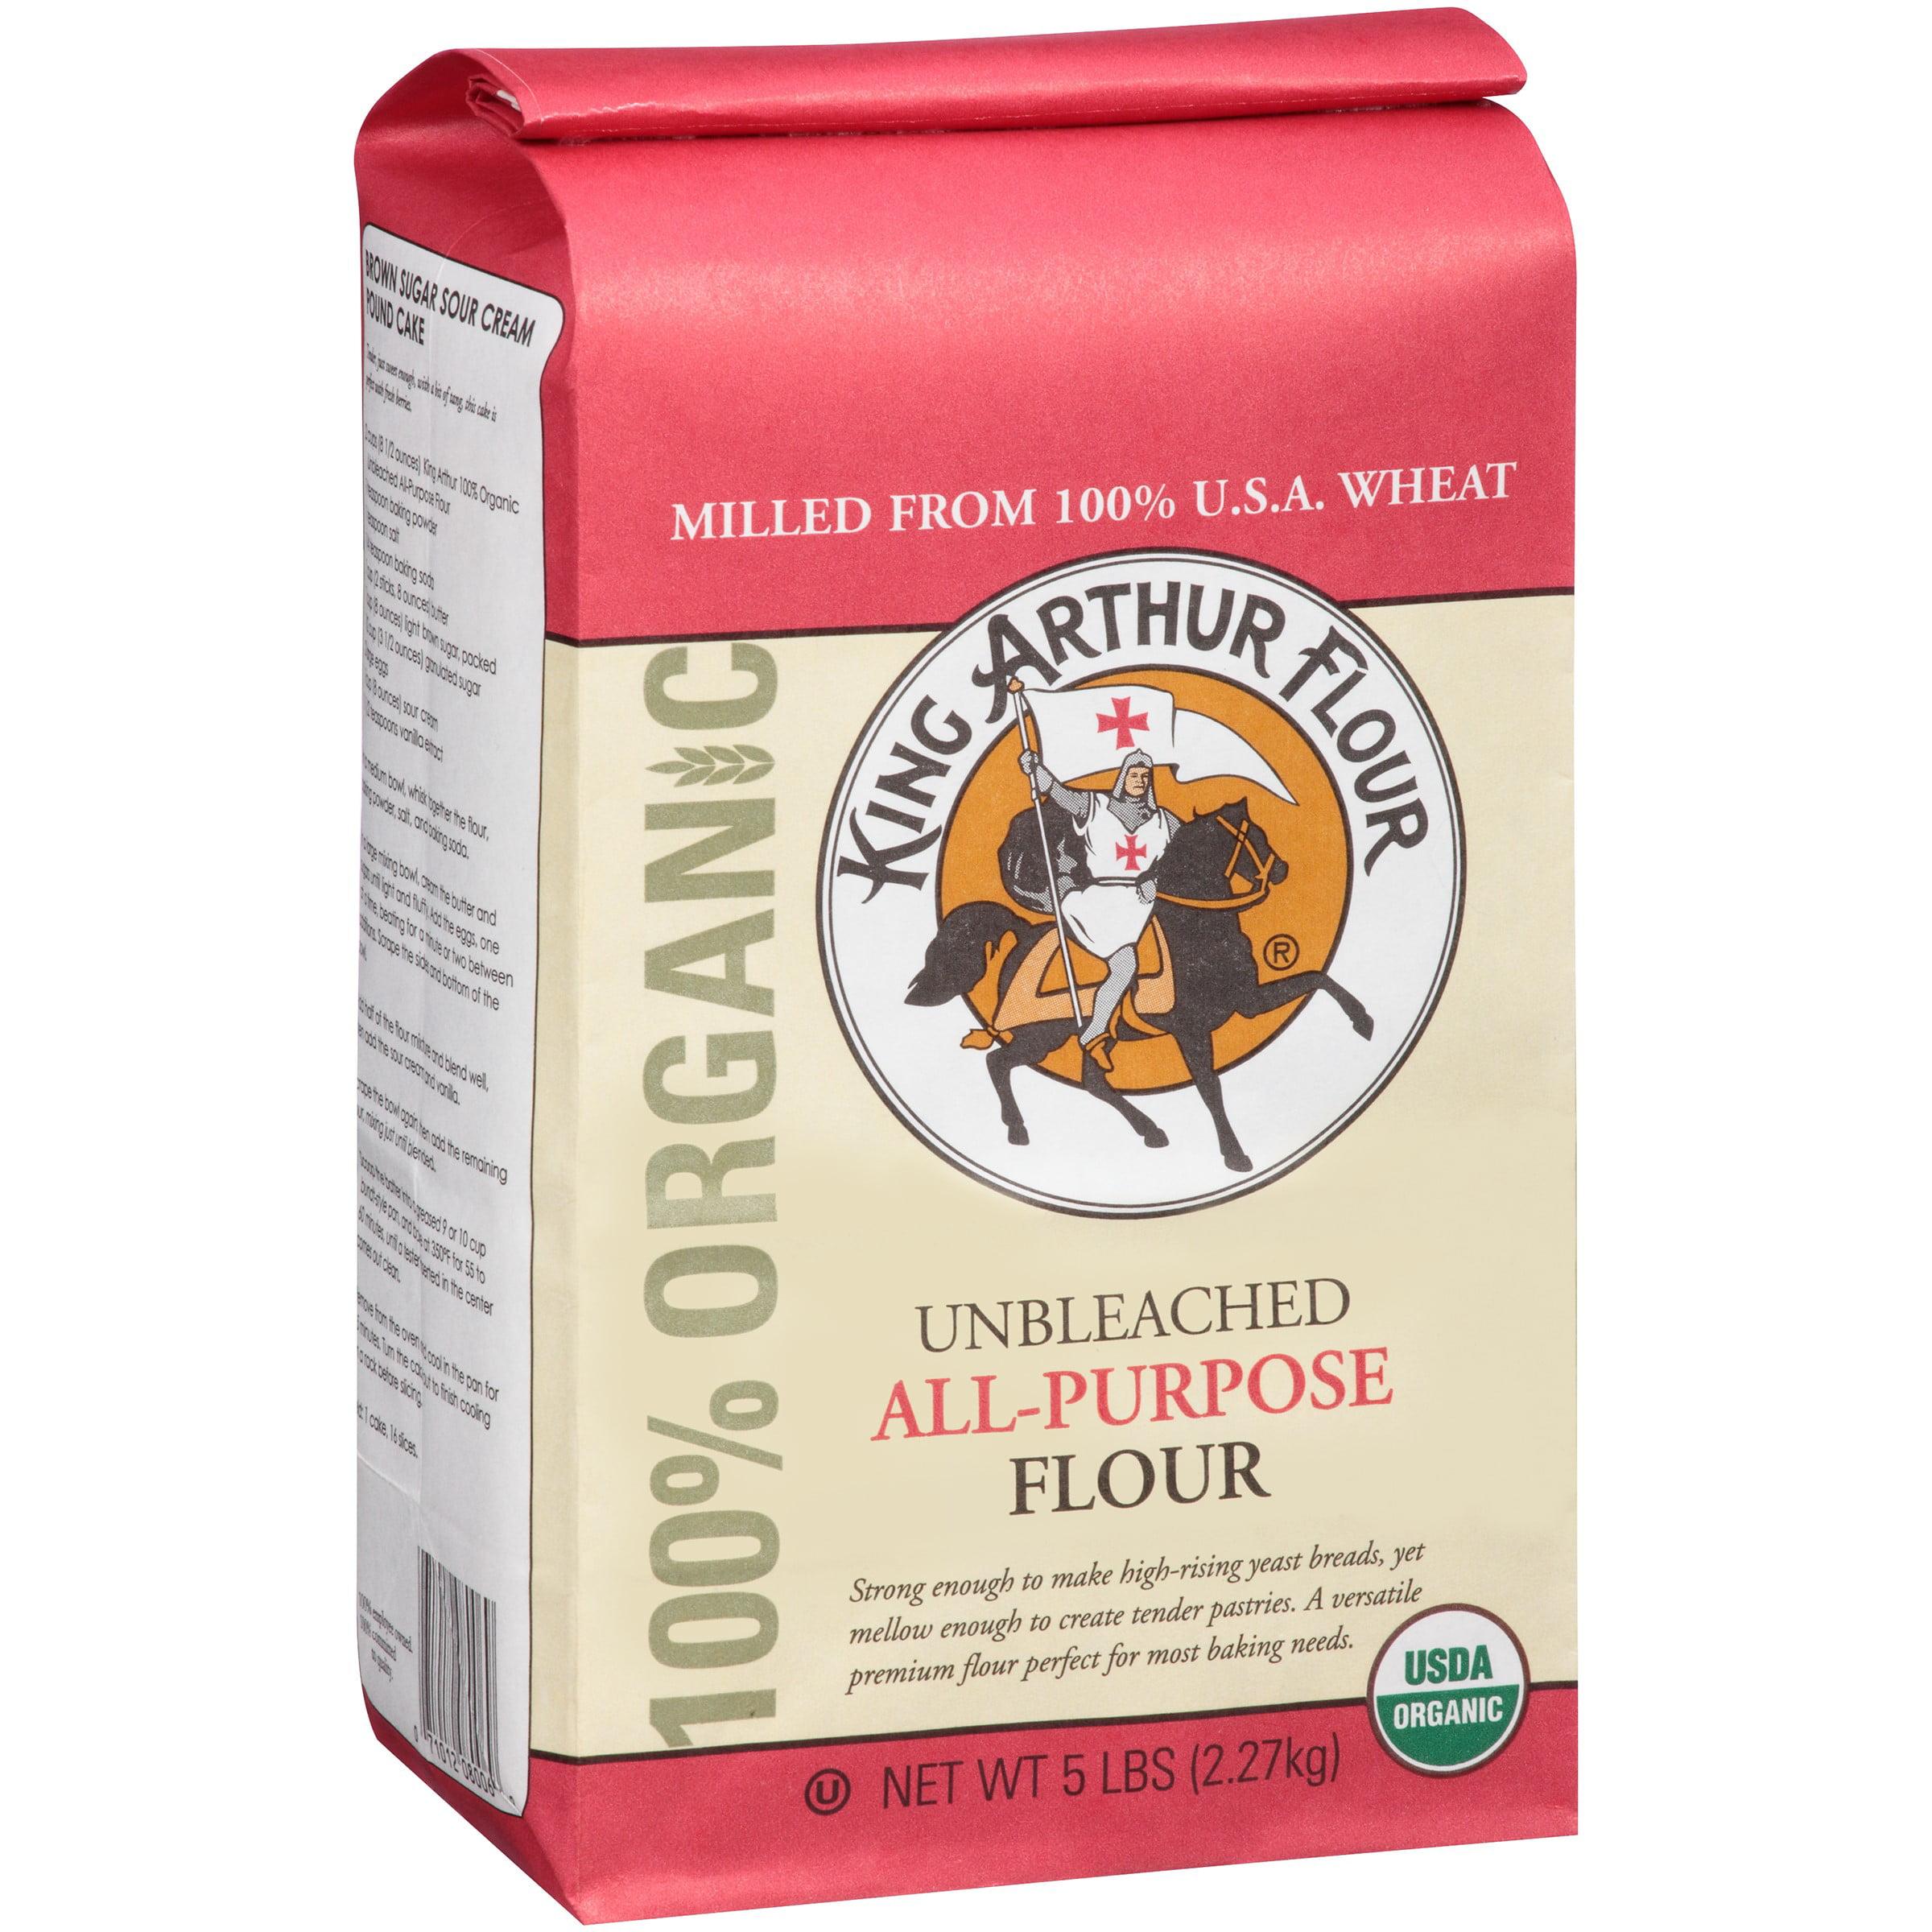 King Arthur Flour Organic Unbleached All Purpose Flour 5 lbs